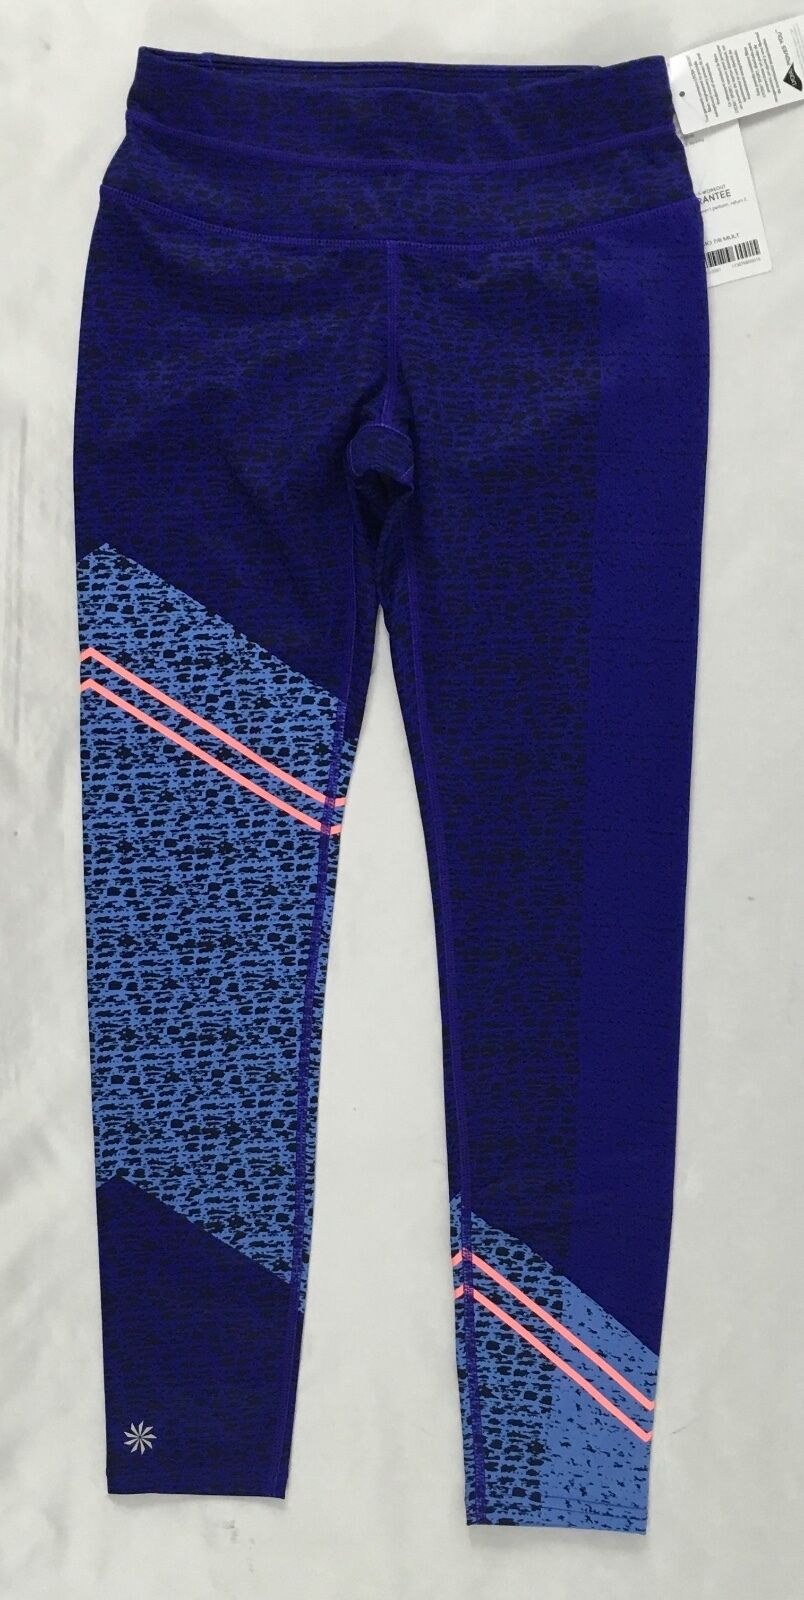 Athleta Women's Mid Rise Asym Camo Sonar 7 8 Tight Purple  Size 2XS